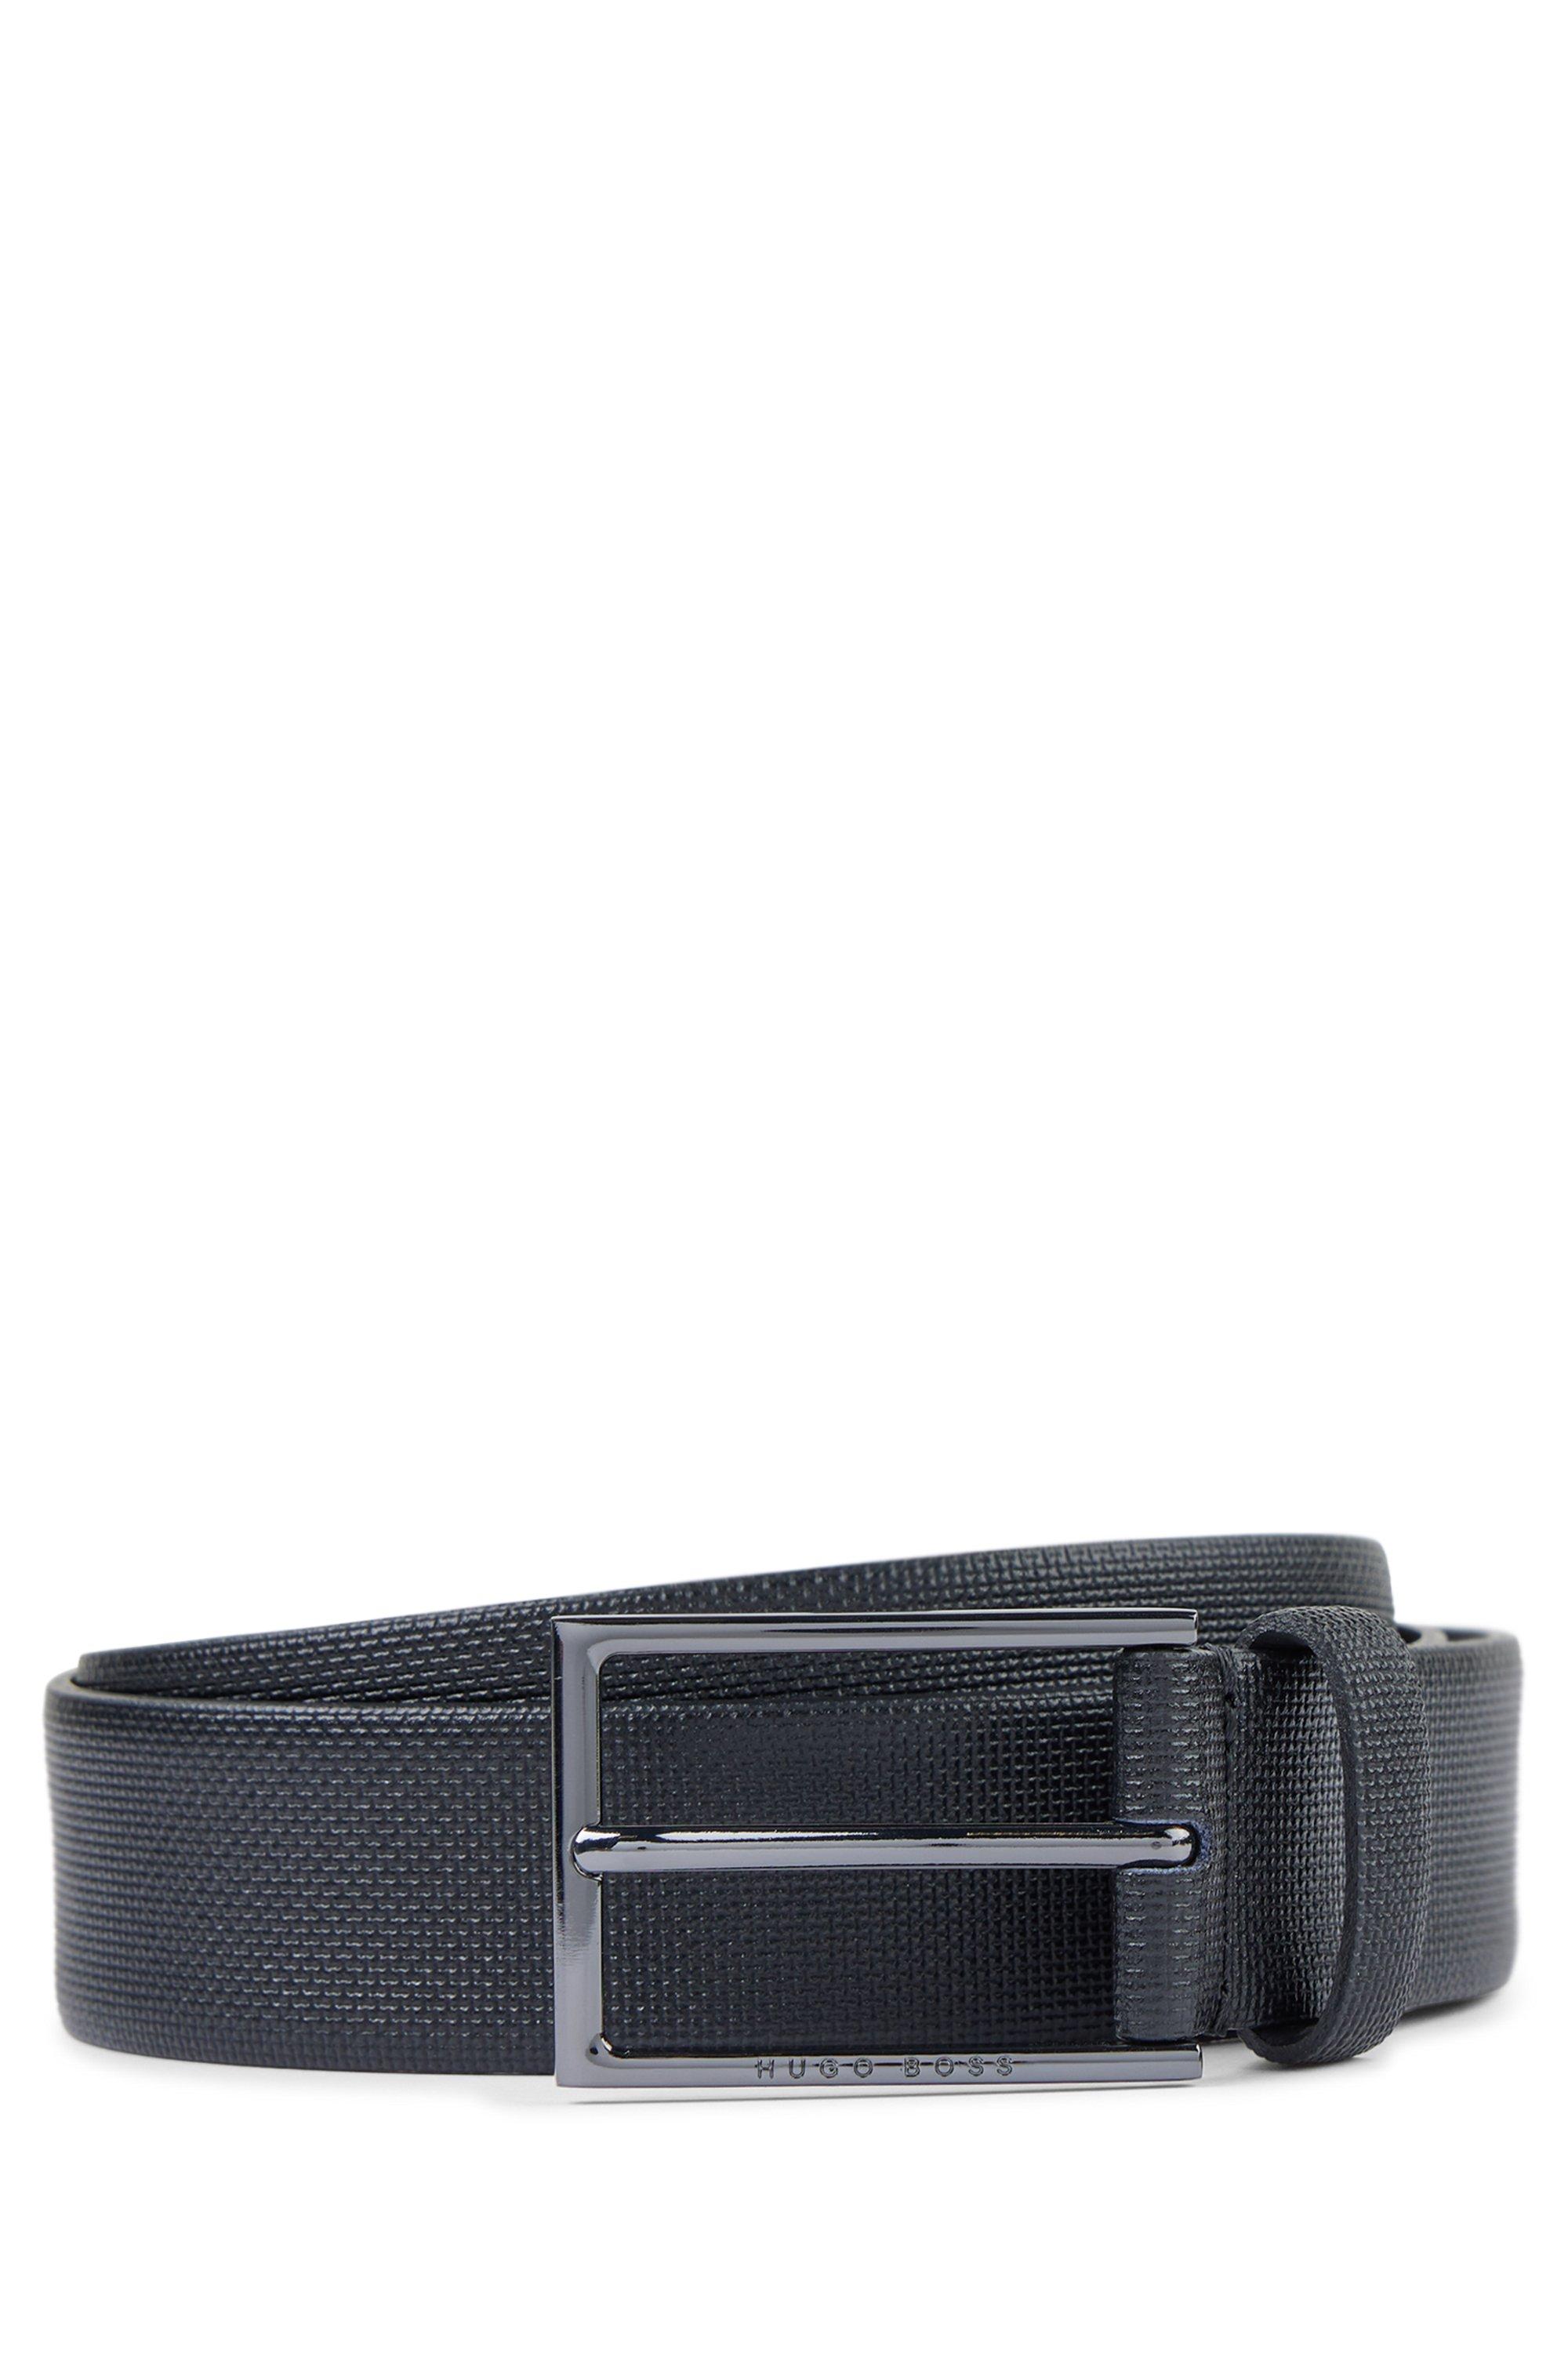 Printed-leather belt with gunmetal buckle, Black